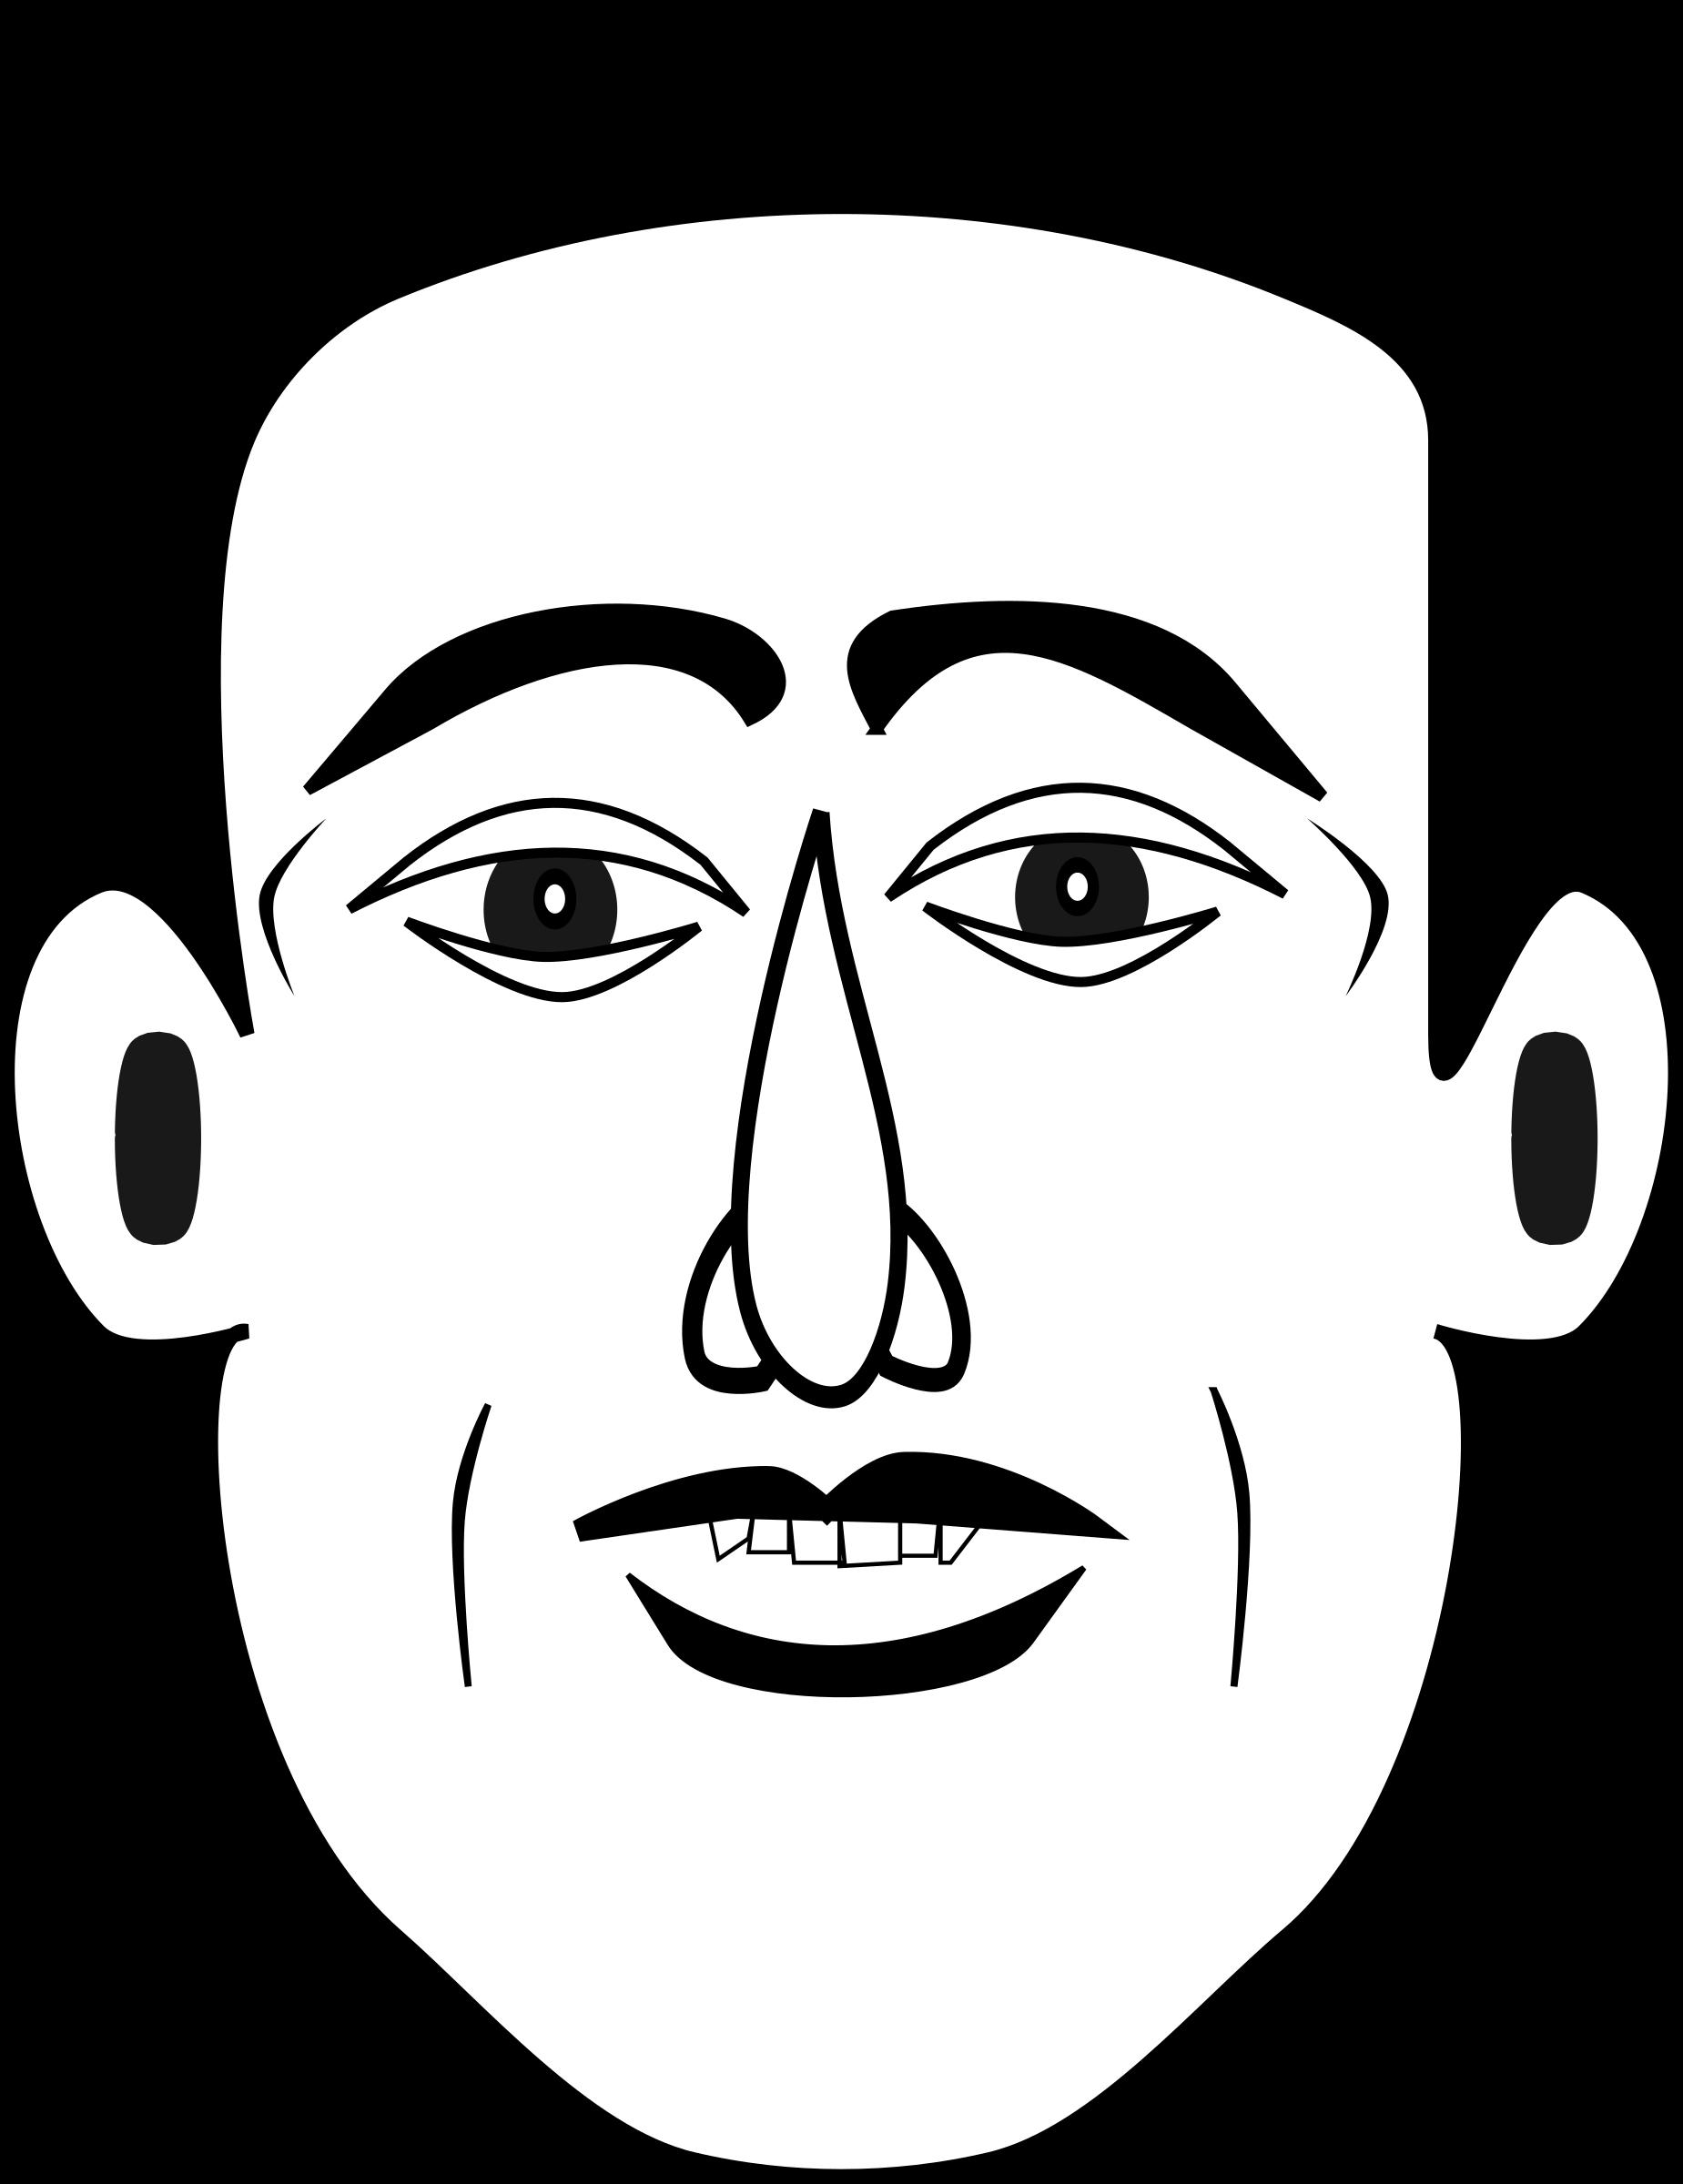 Мужчина лицо смешное рисунок